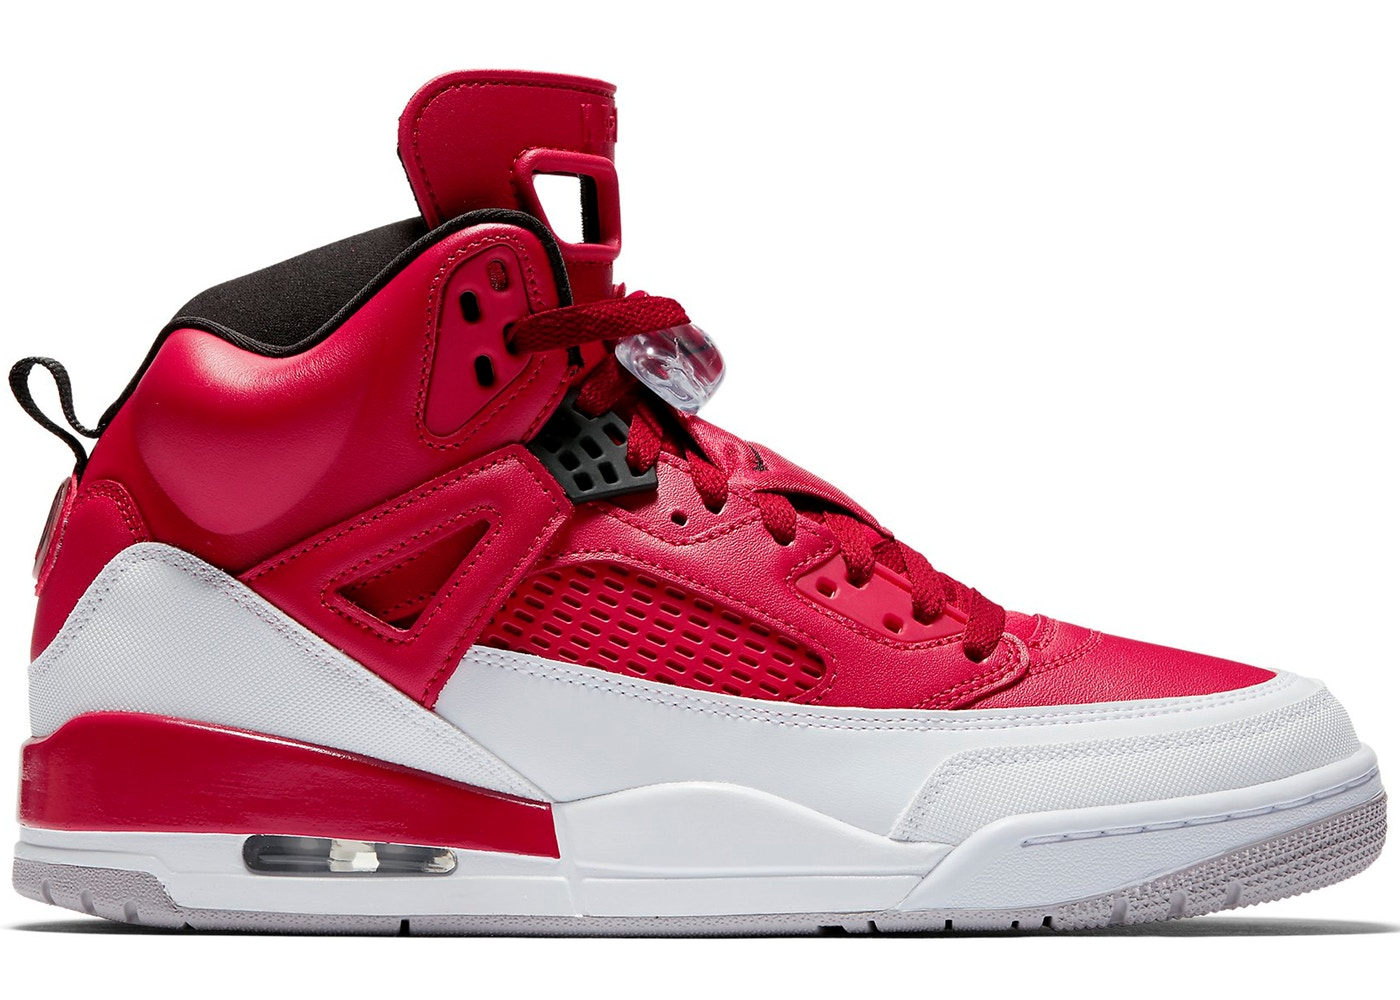 online retailer c97c4 b4585 Air Jordan Spizike Size 9 Shoes - Average Sale Price